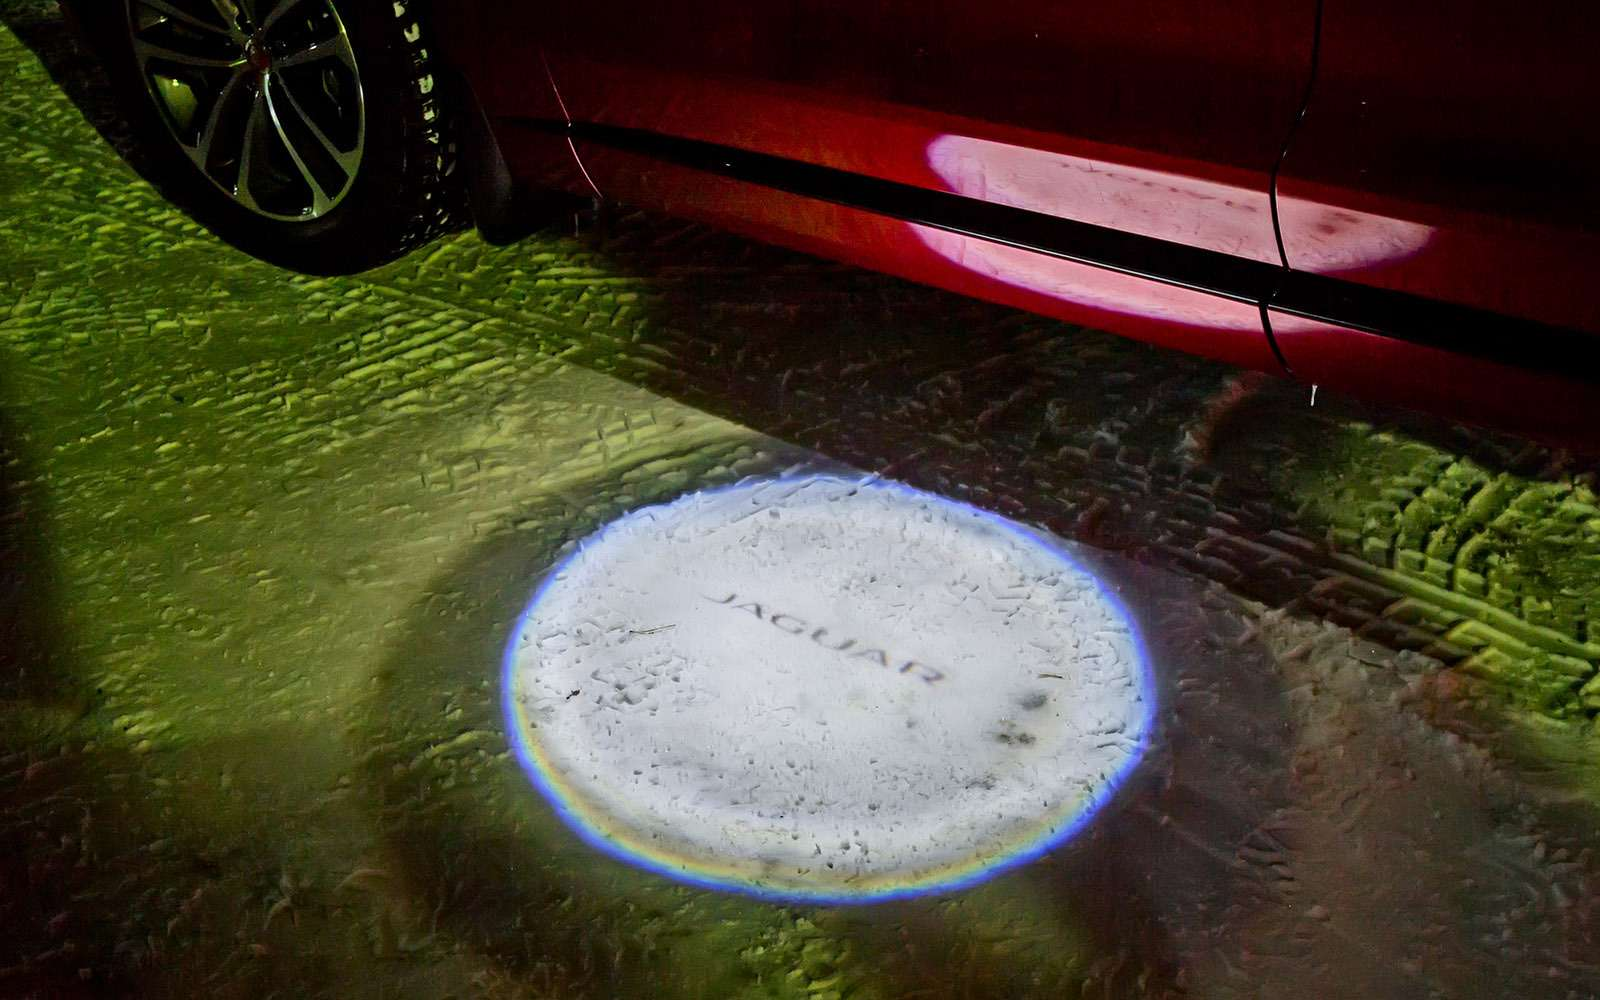 Тест премиум-кроссоверов: Lexus RX350, Cadillac XT5и Jaguar F-Pace— фото 721774